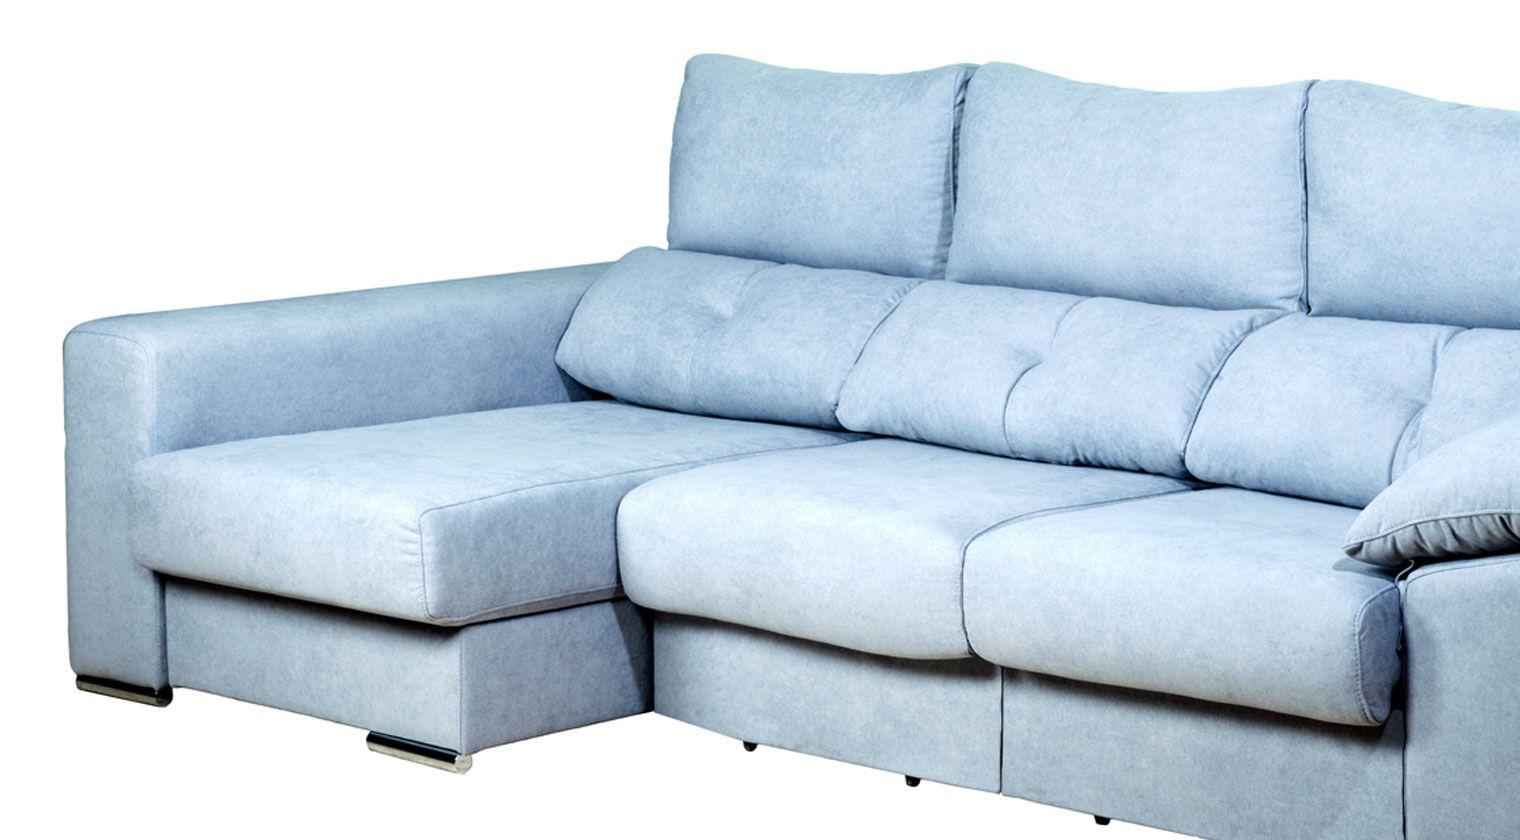 Comprar chaise longue tela herm s mod 4 plazas chaise for Chaise longue 4 plazas baratos